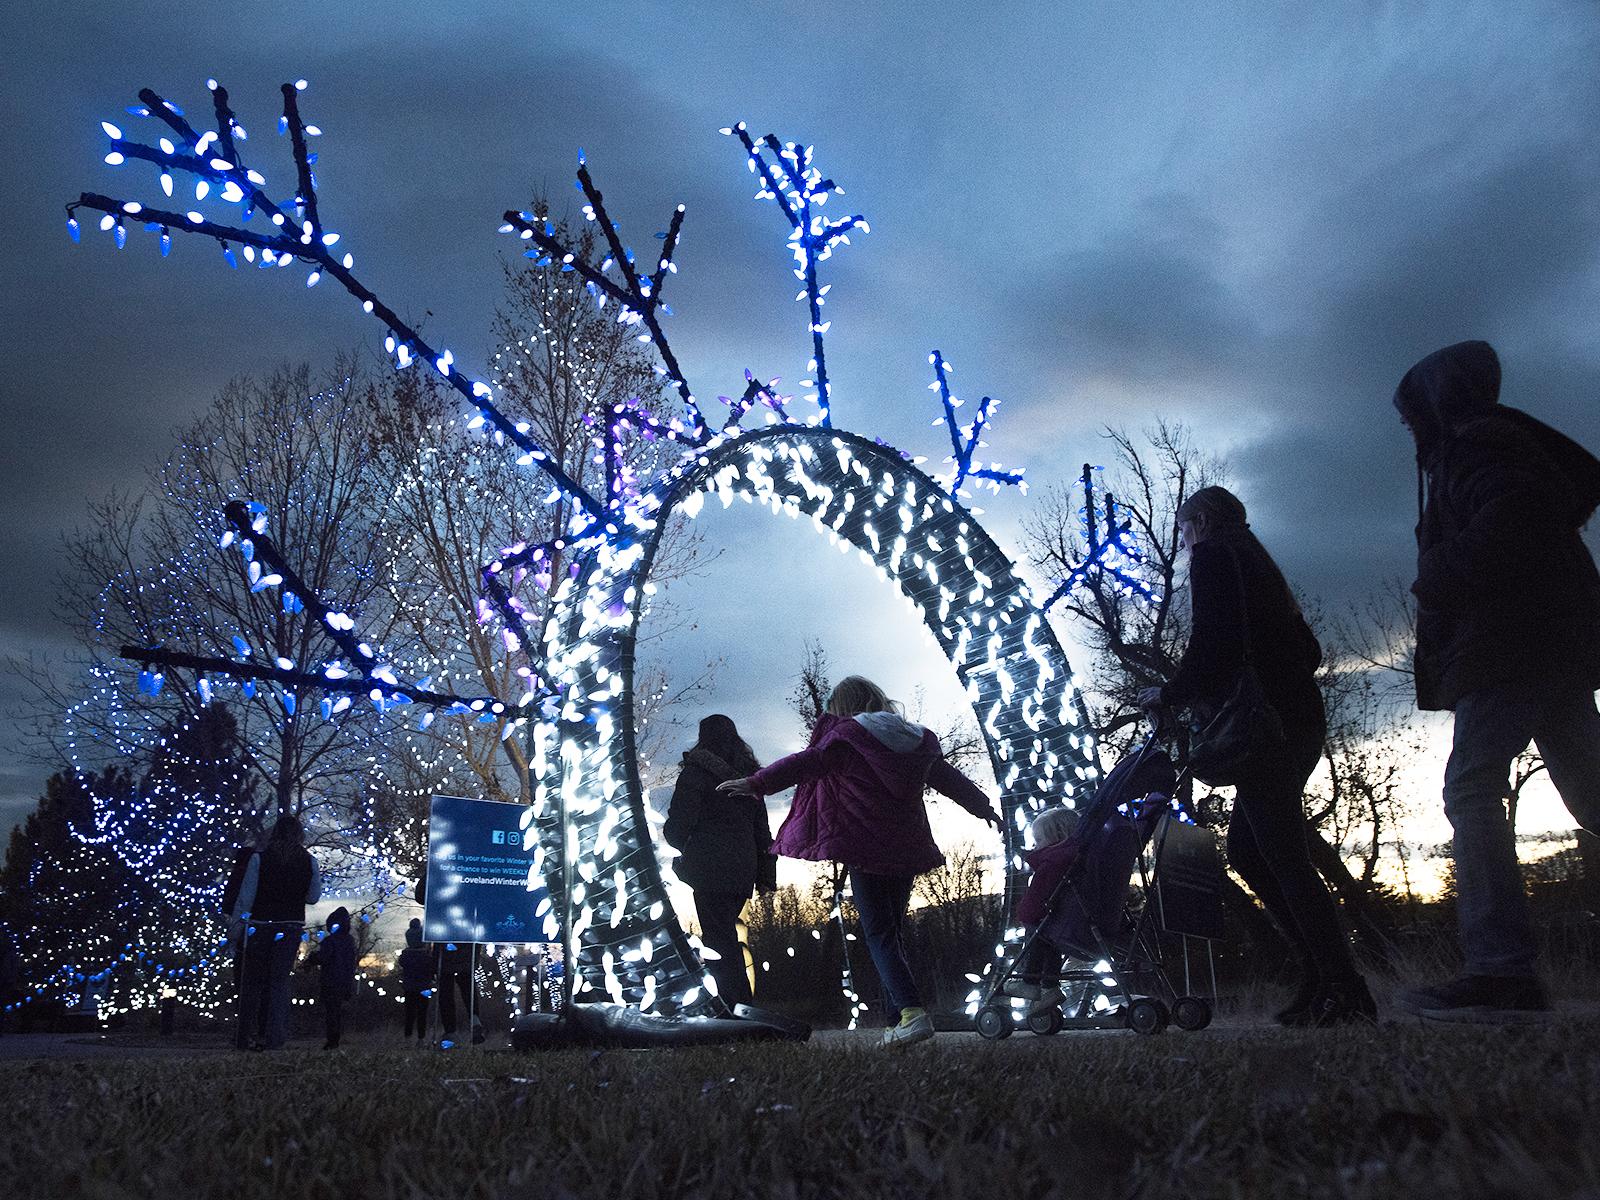 Loveland's Winter Wonderlights